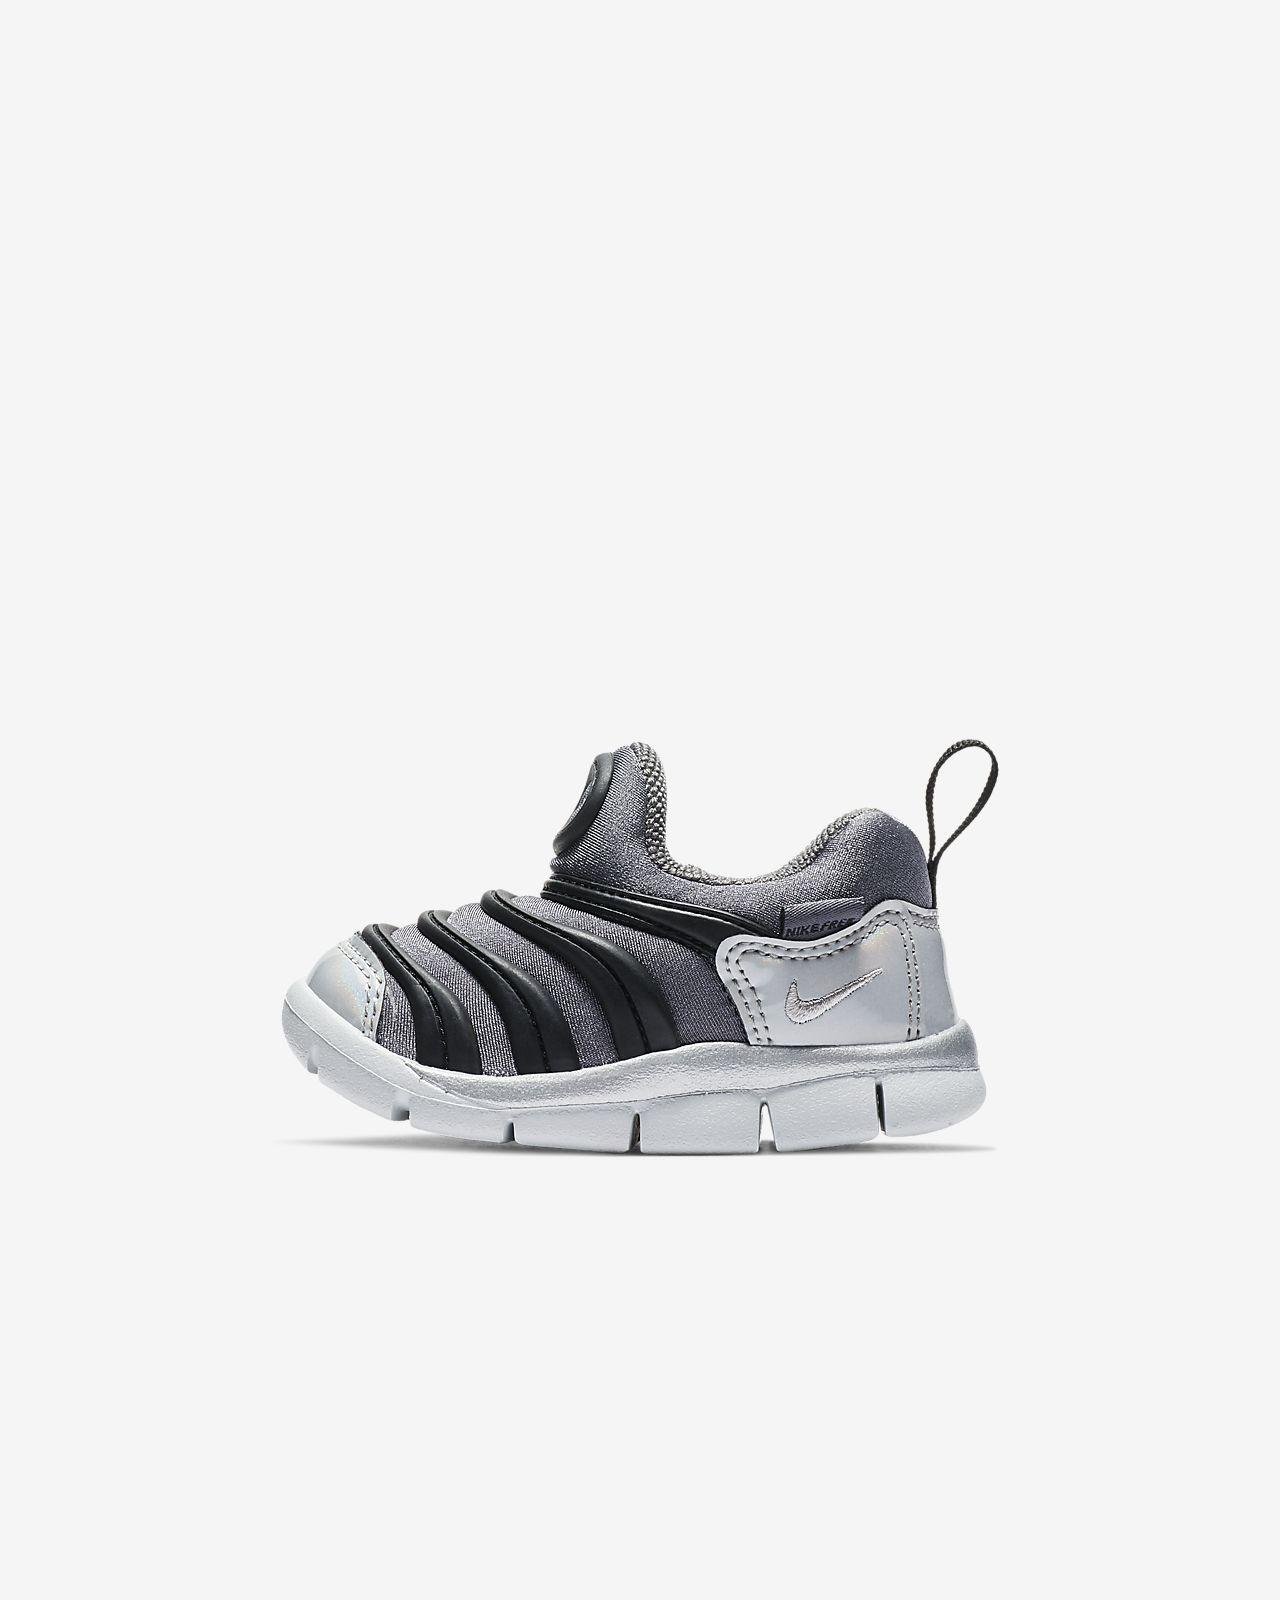 Nike Dynamo Free Y2K Infant/Toddler Shoe